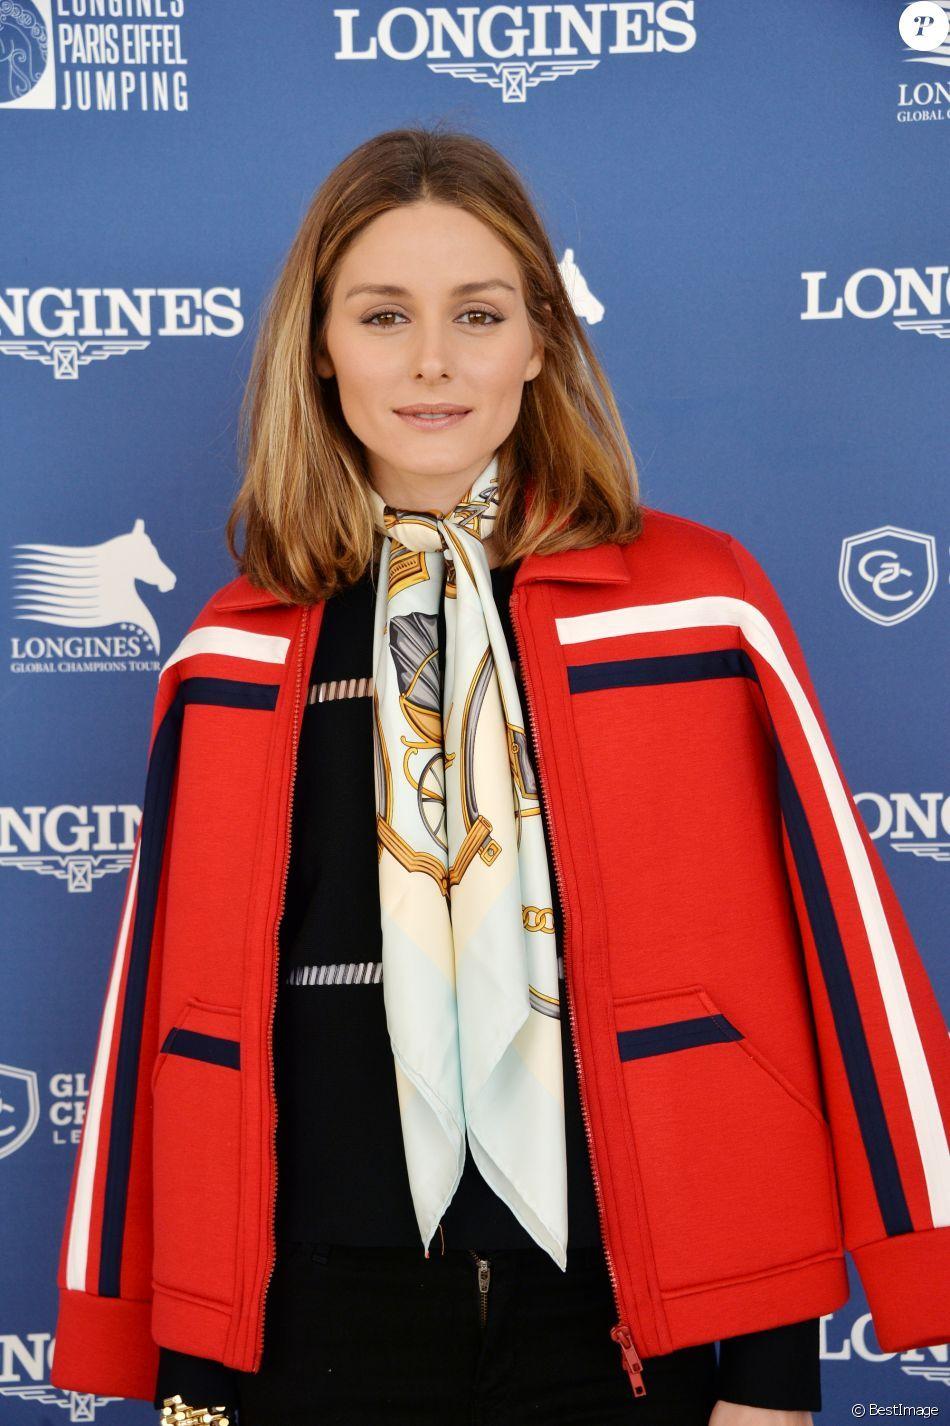 The Olivia Palermo Lookbook : Olivia Palermo At Paris Haute Couture Fashion Week